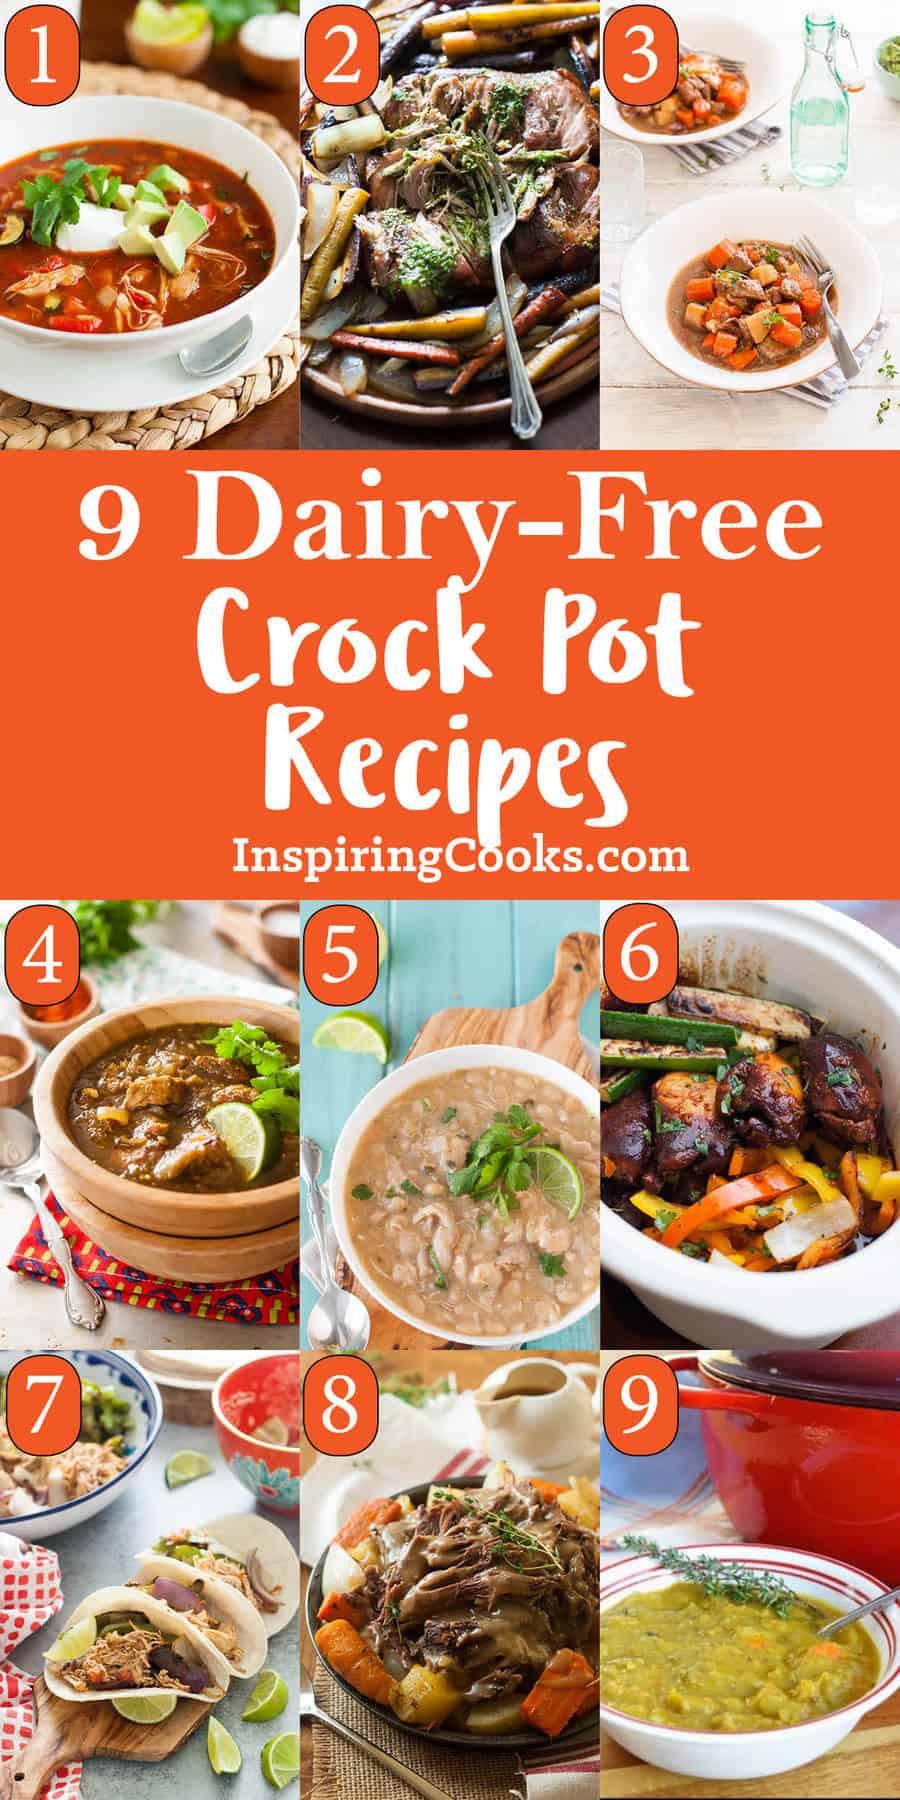 Dairy Free Crockpot Recipes  9 Dairy Free Crock Pot Recipes No Milk or Cream Here